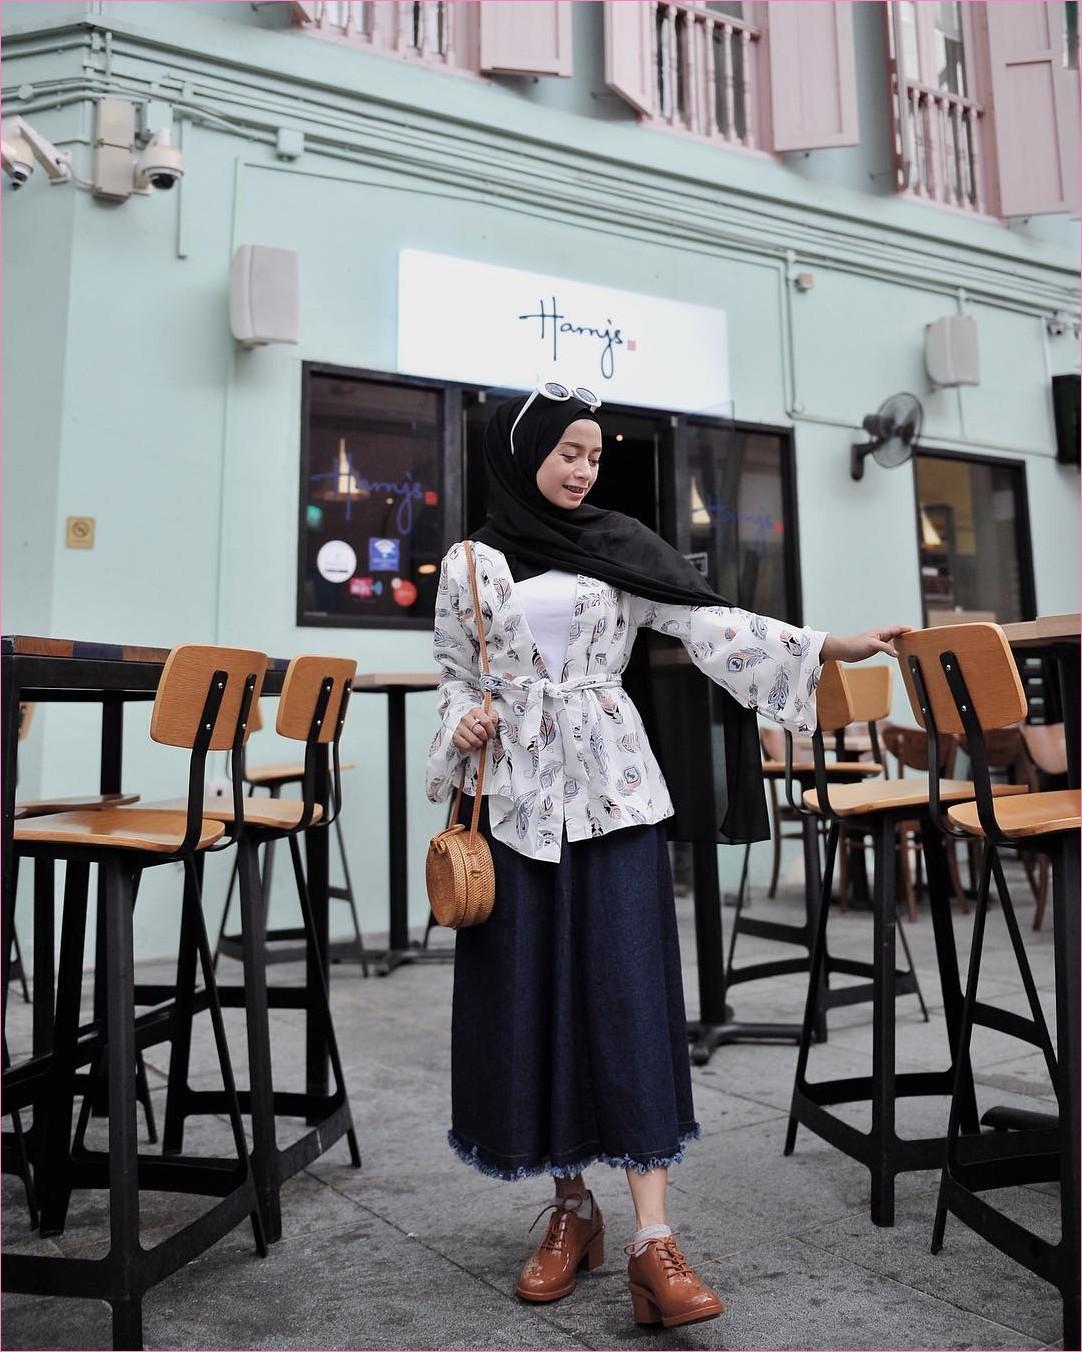 Outfit Rok Untuk Hijabers Ala Selebgram 2018 ankle boots coklat tua putih hijab pashmina rawis hitam top mangset blouse putih abu slingbags rotan coklat kacamata bulat kaos kaki rok jeans denim skirt ootd trendy